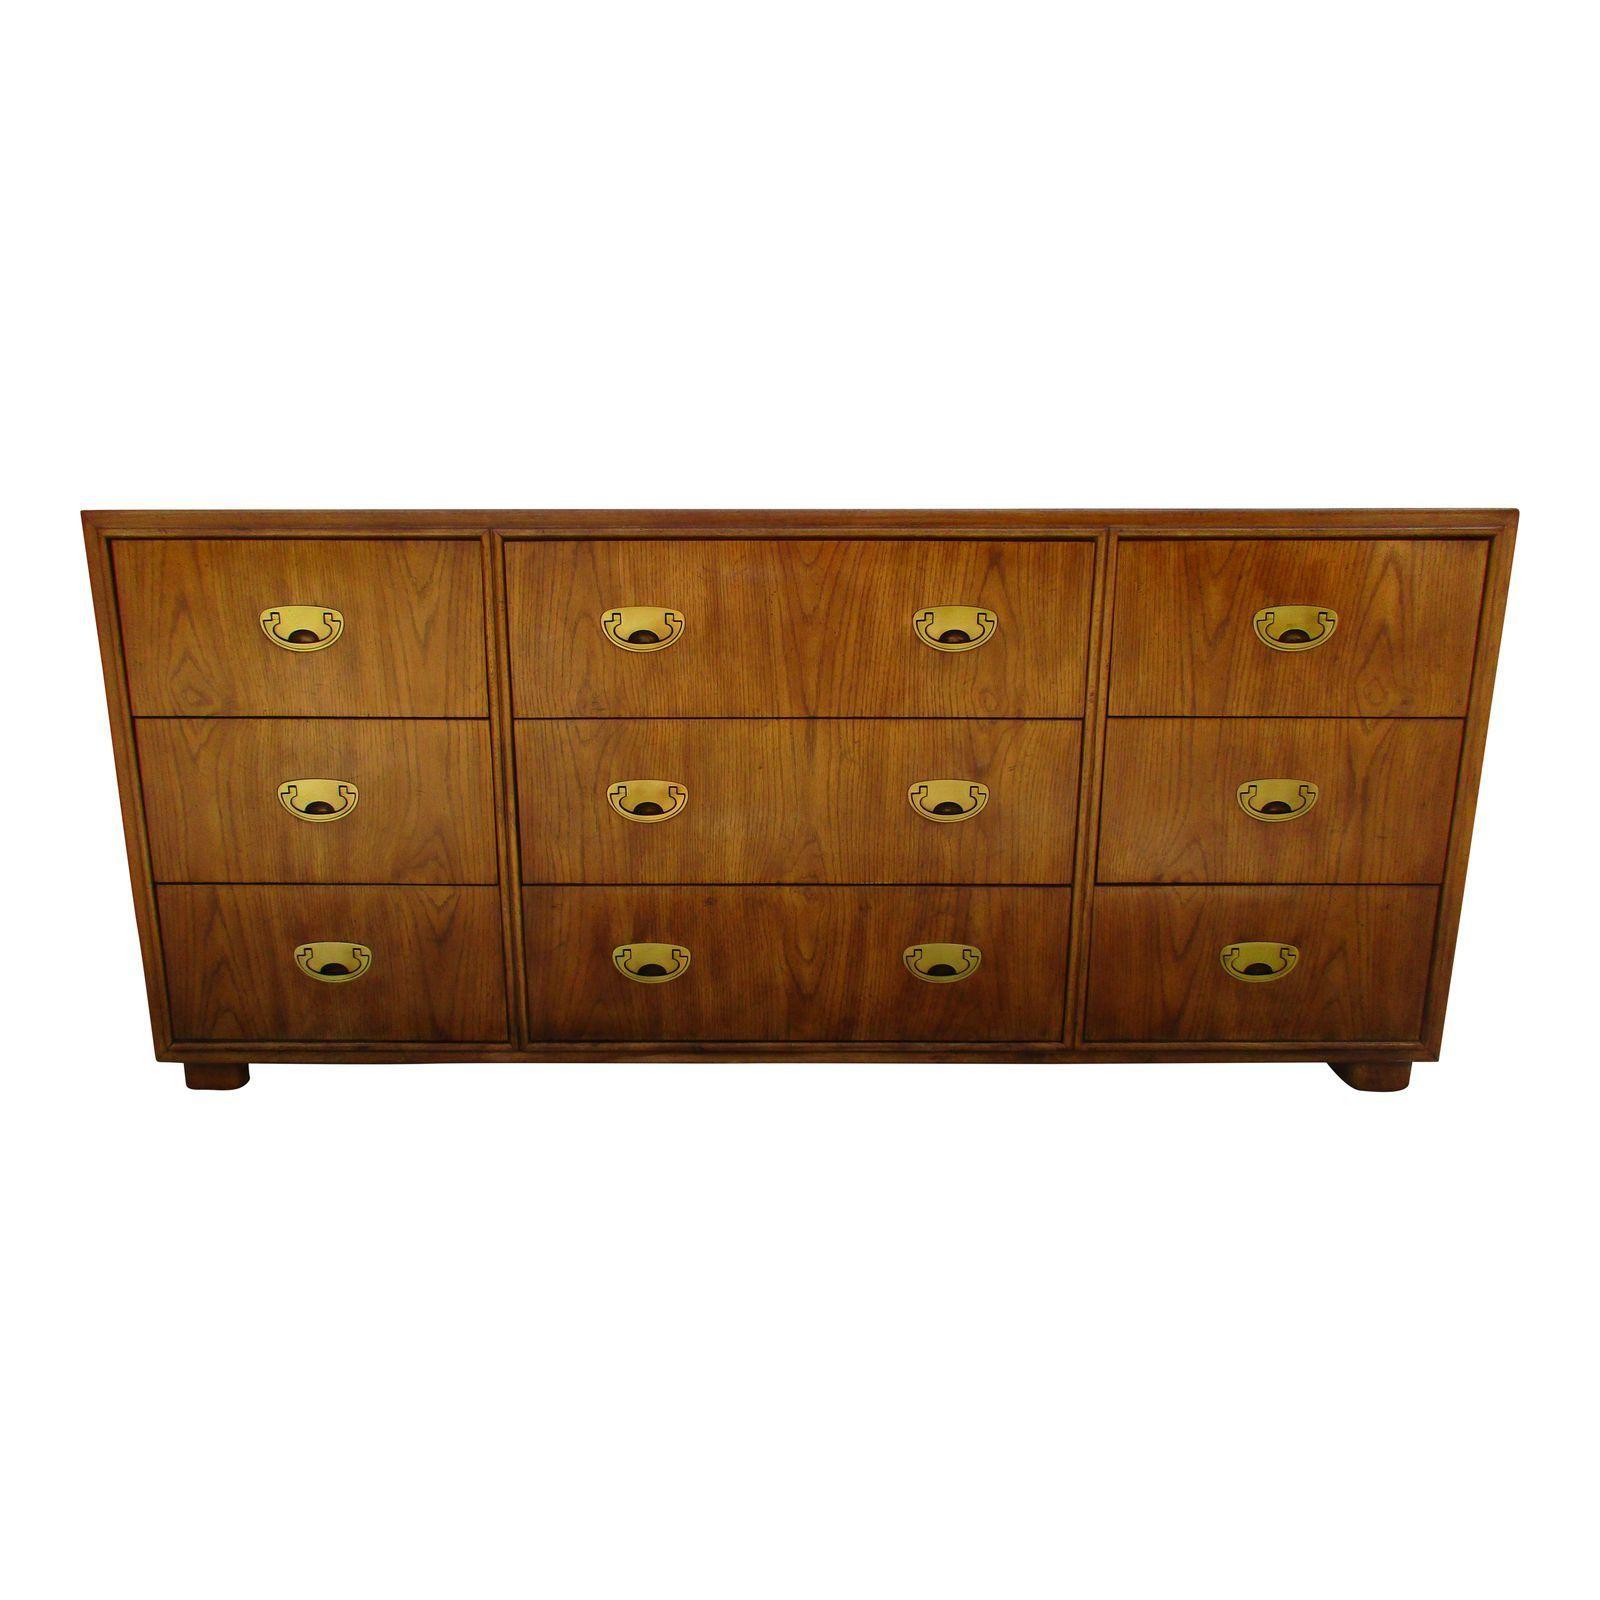 Drexel Heritage Passage Collection Triple Dresser Drexel Heritage Furniture Rehab Drexel